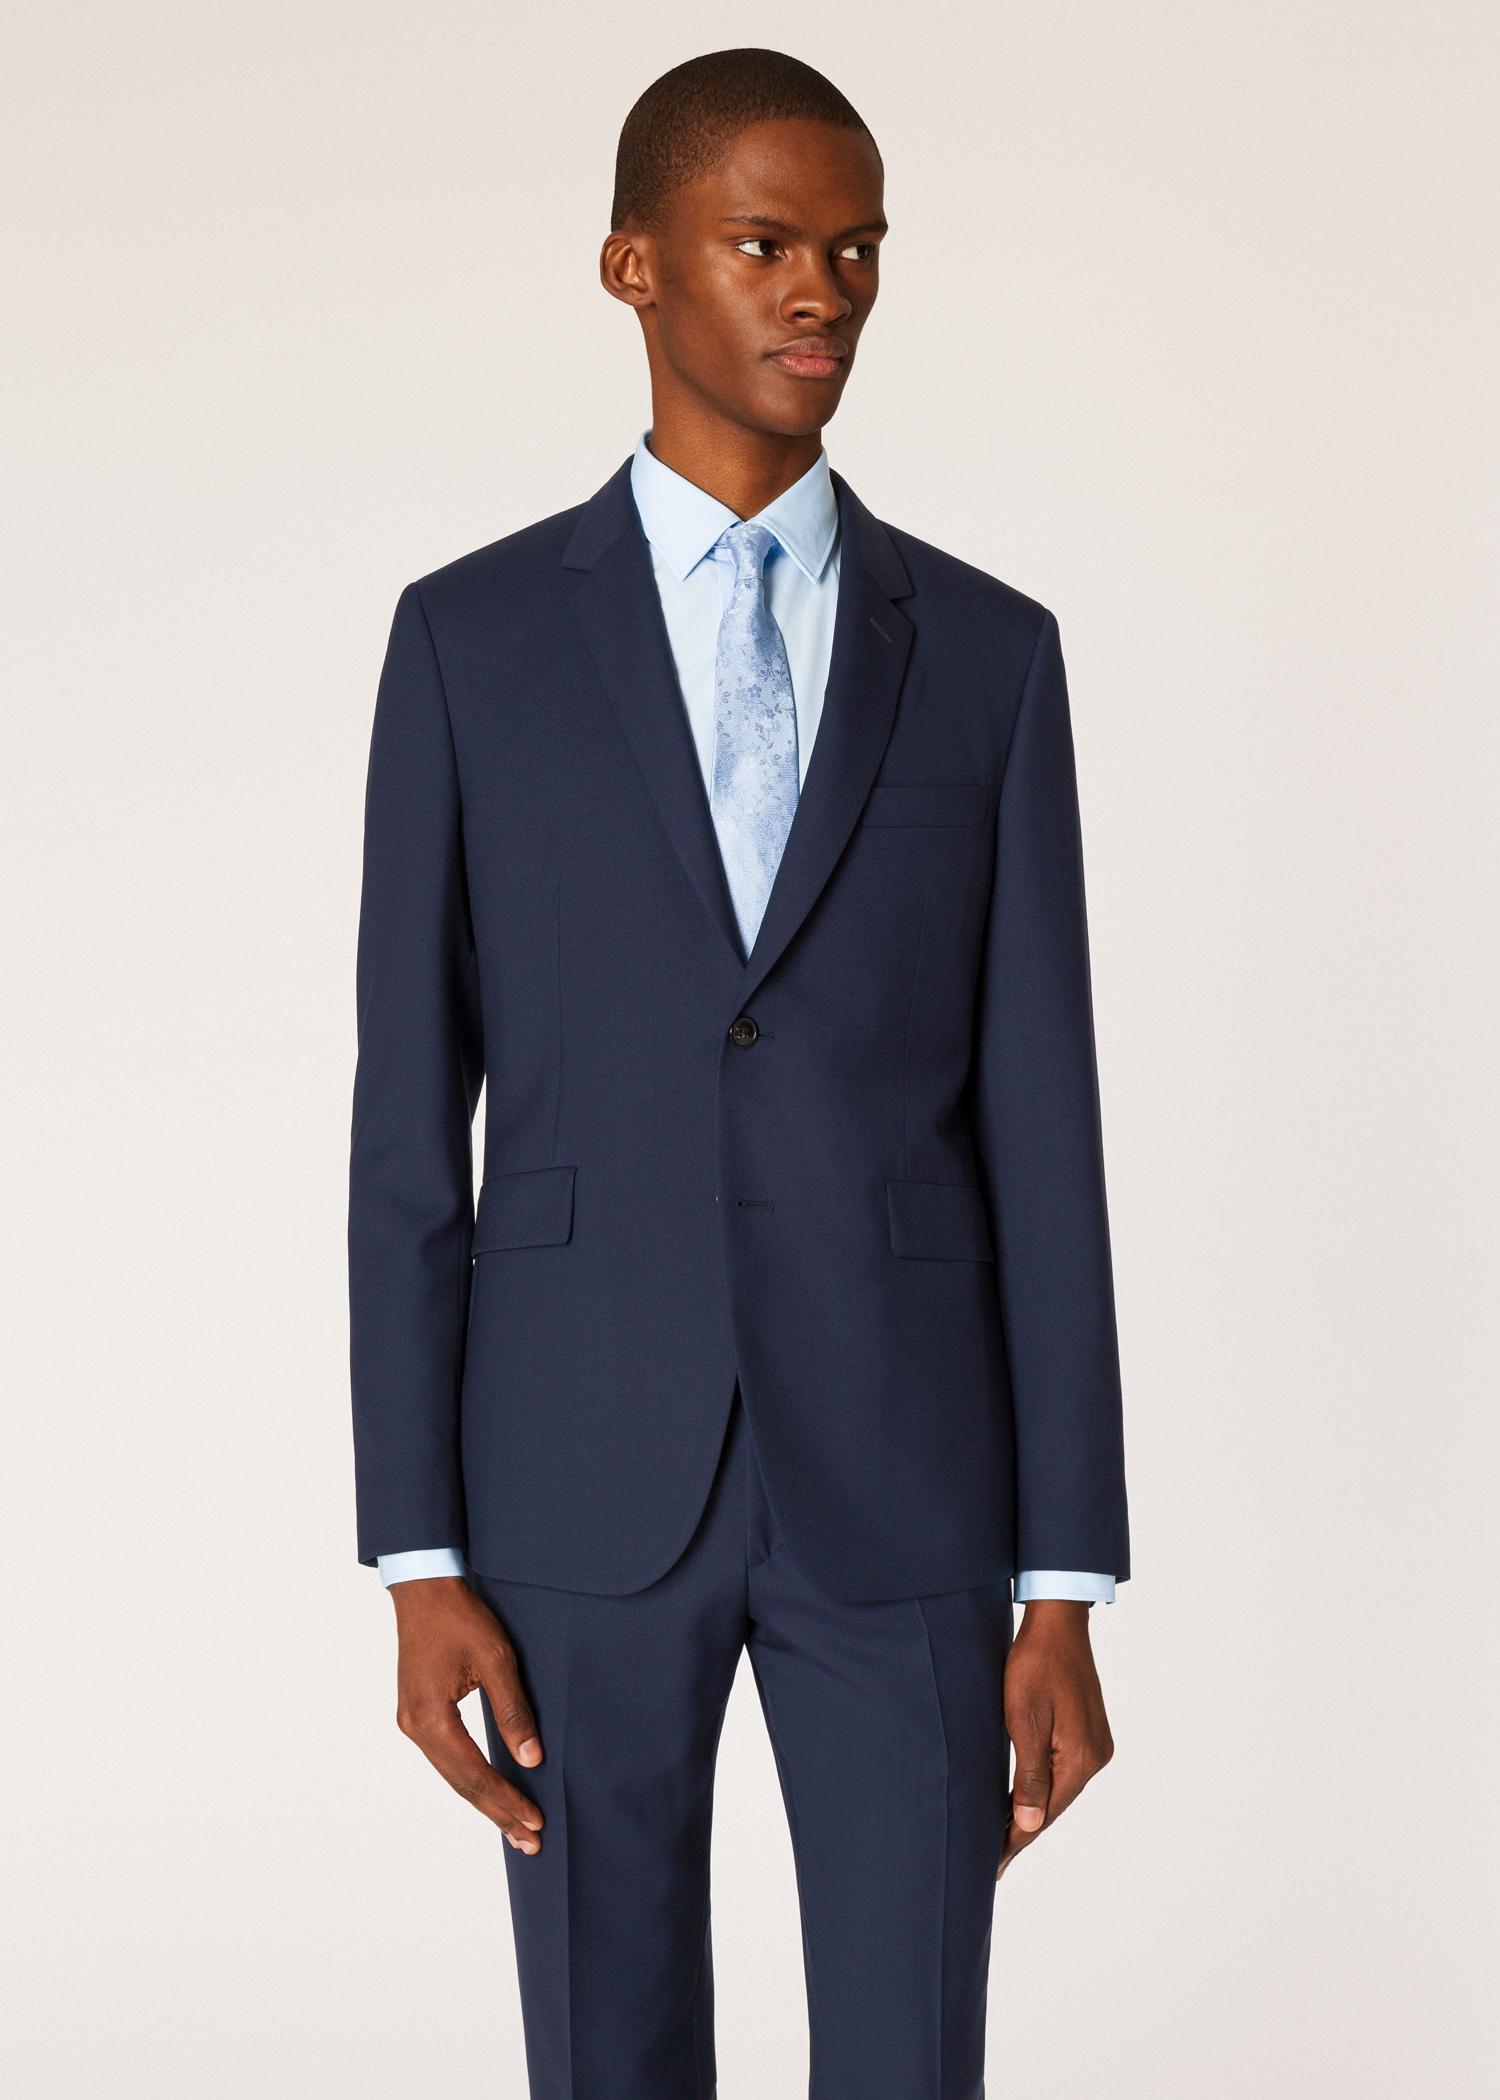 364bffbf8f The Kensington - Men's Slim-Fit Navy Wool 'A Suit To Travel In'